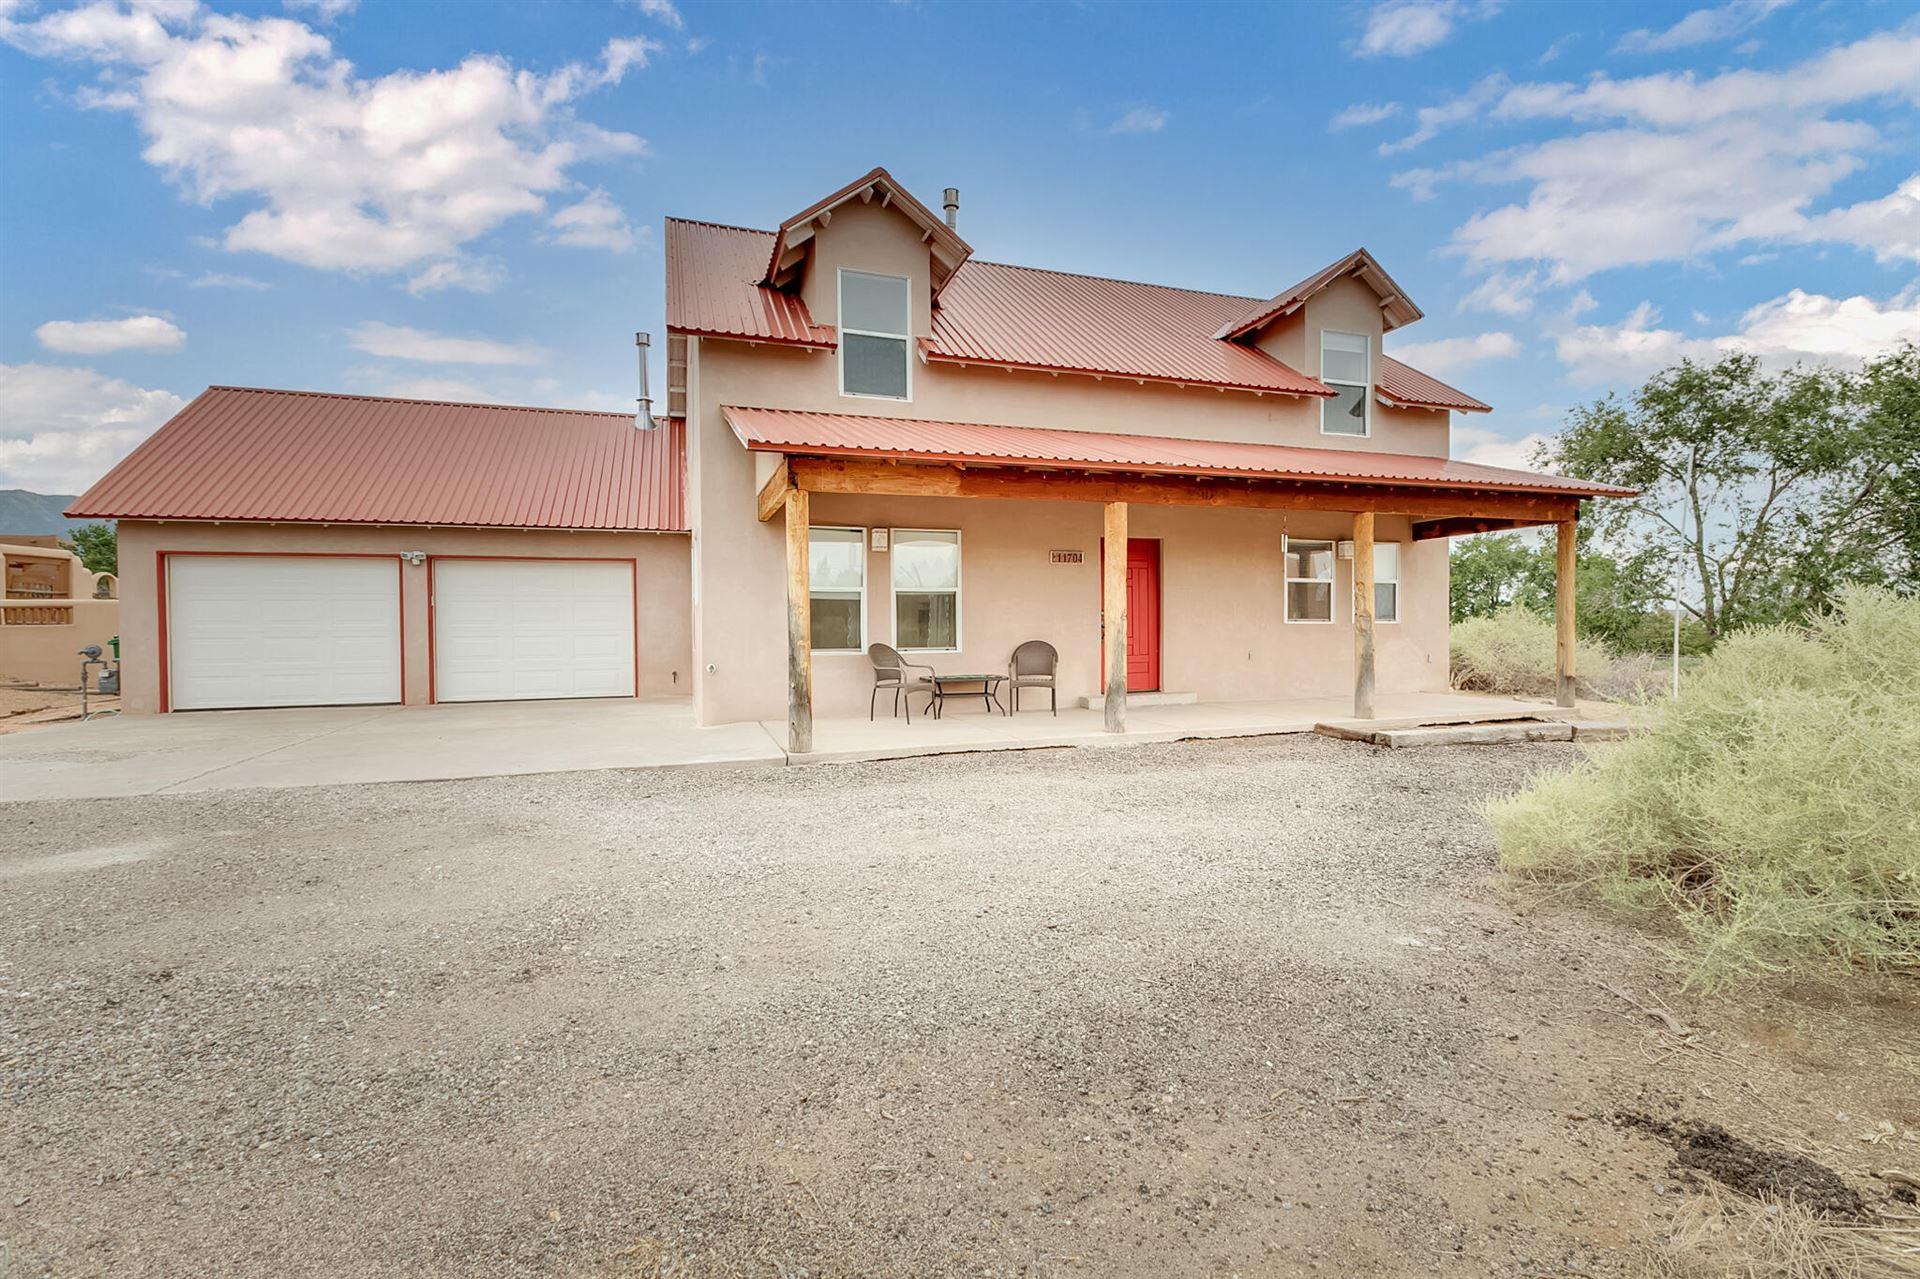 Photo of 11704 RICHFIELD Avenue NE, Albuquerque, NM 87122 (MLS # 993723)